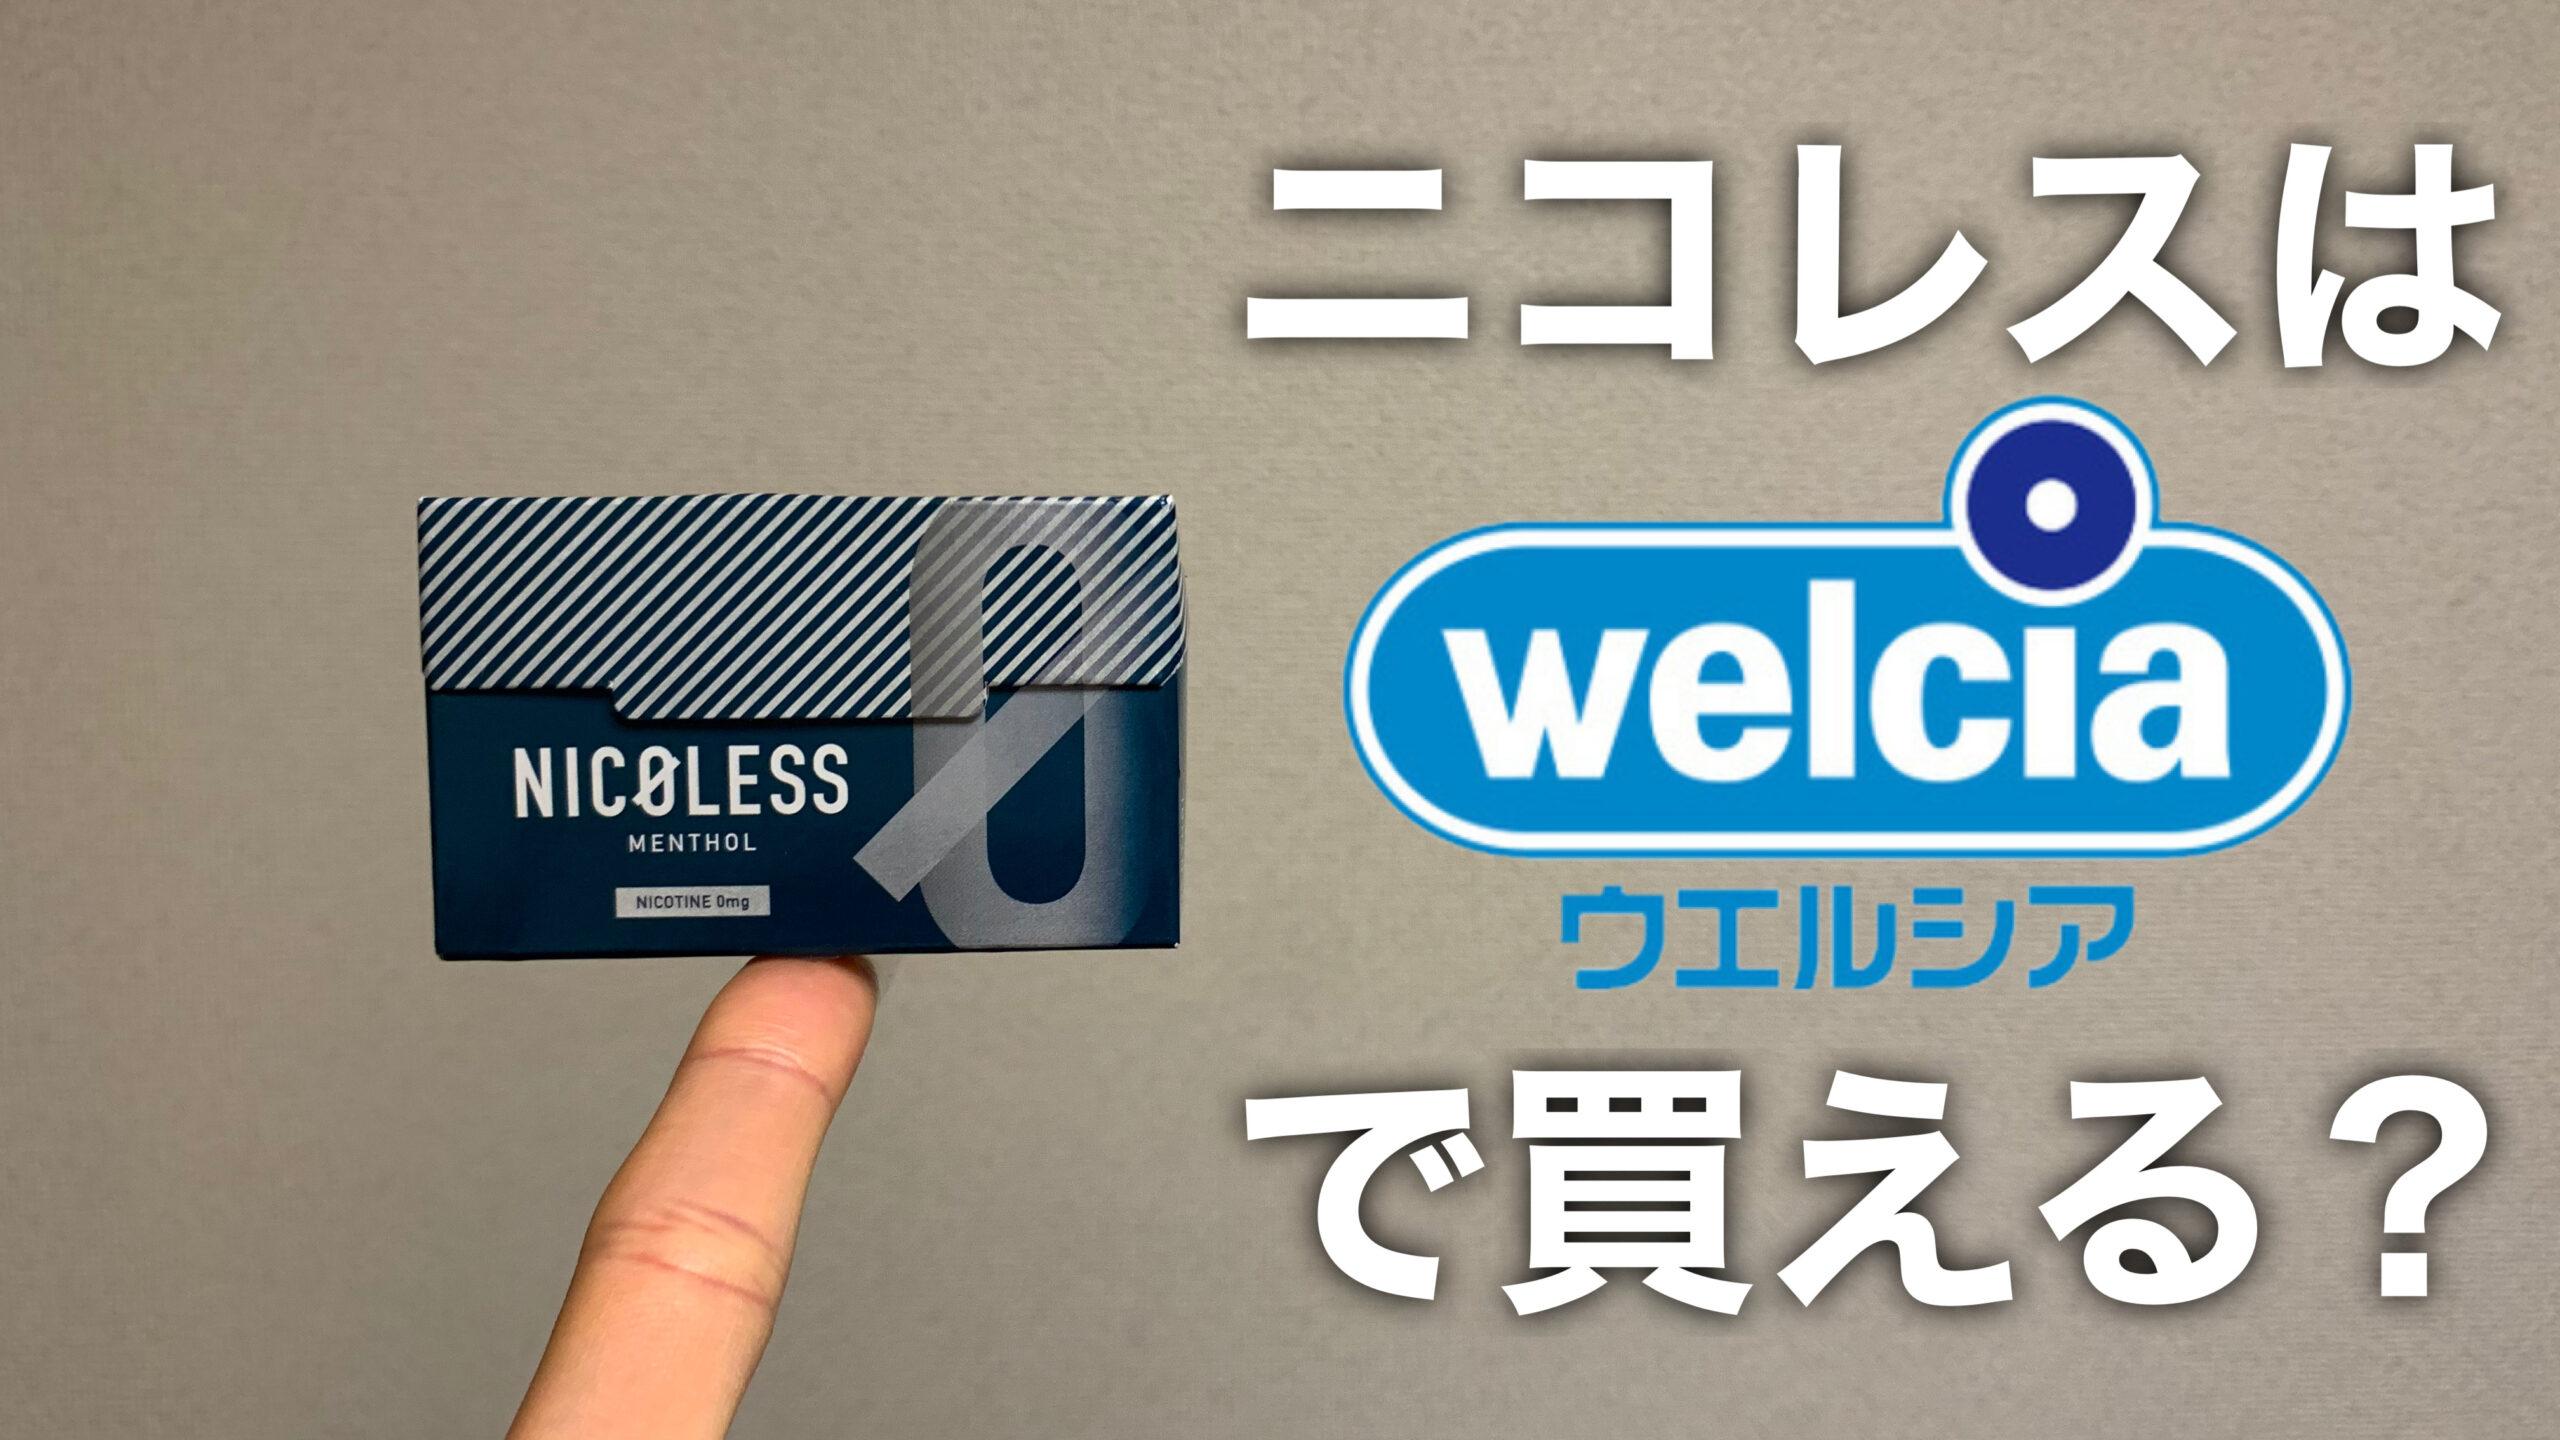 nicoless-welcia eyecatch